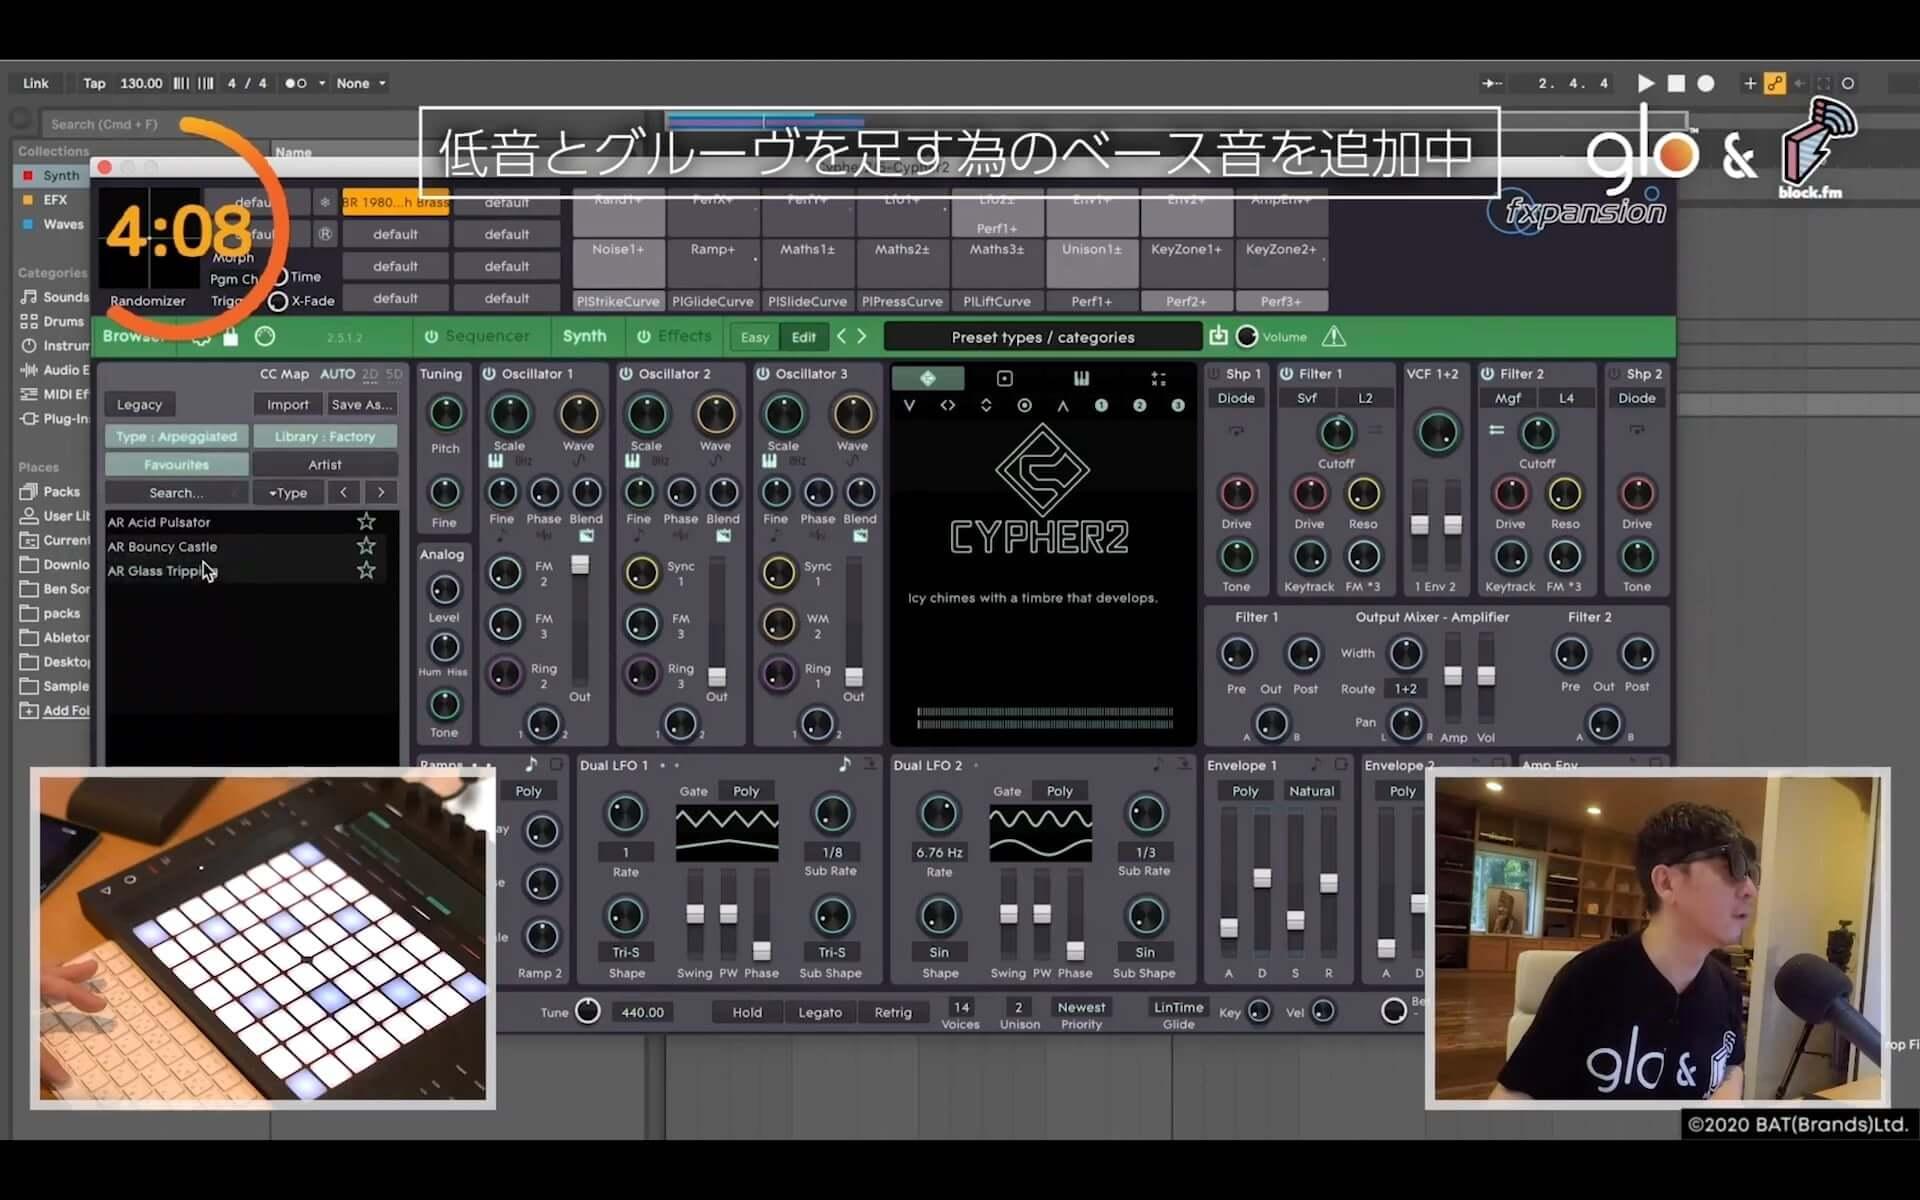 Seiho、tofubeats、Yamato、☆Taku Takahashiが様々なお題に挑戦!glo™とblock.fmが贈る動画シリーズが公開 music200916_glo-blockfm_3-1920x1200